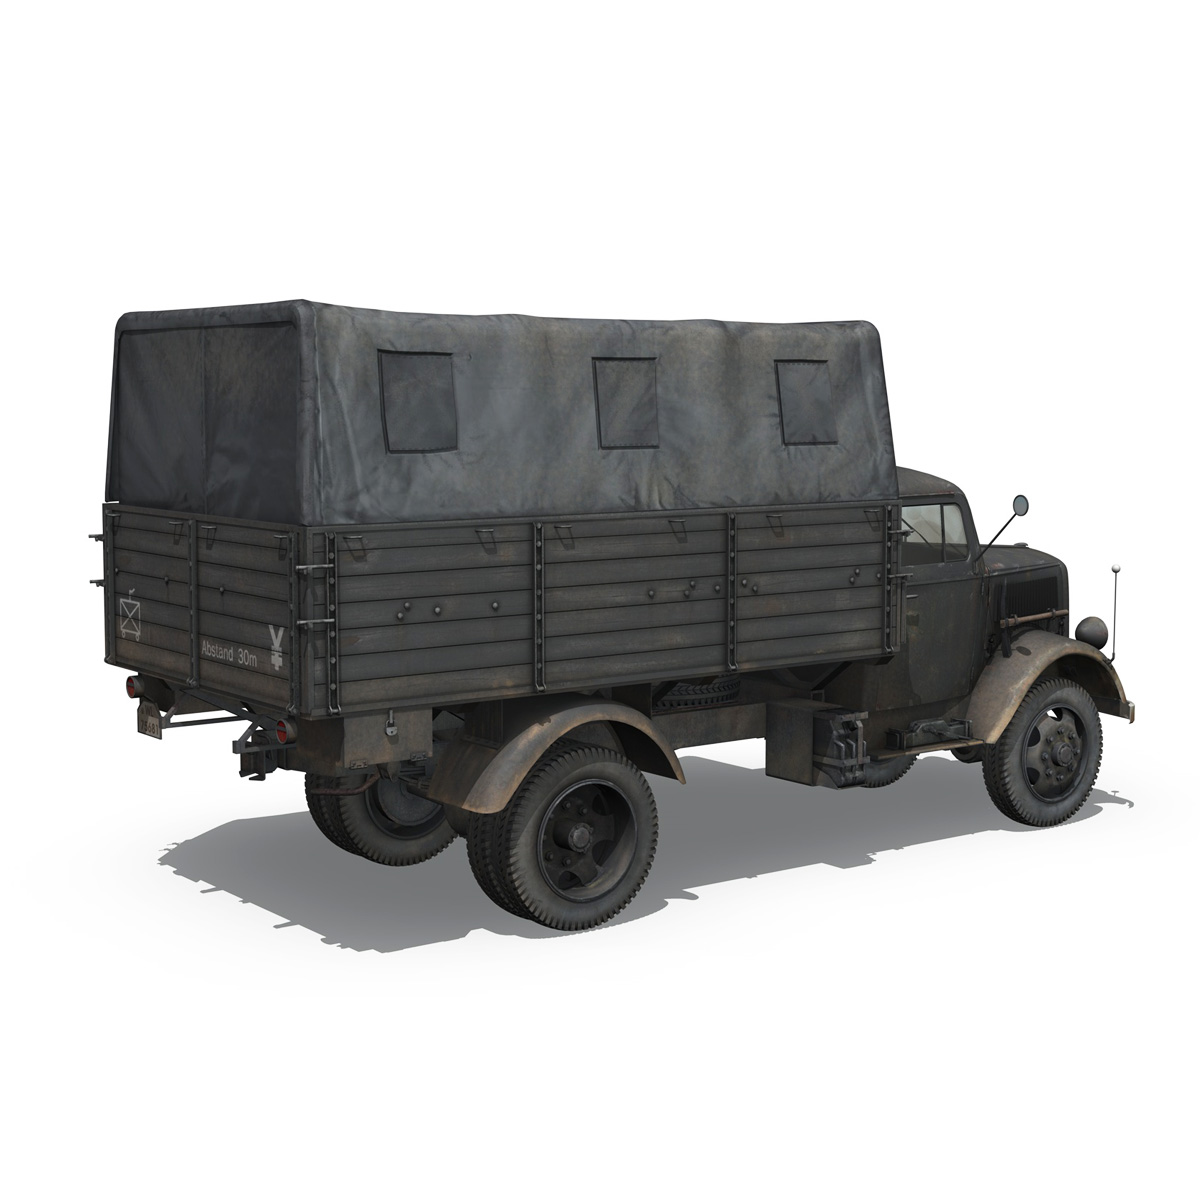 blitz opel - lori cargo 3t - 17 pzdiv model 3d 3ds fbx c4d lwo obj 197200